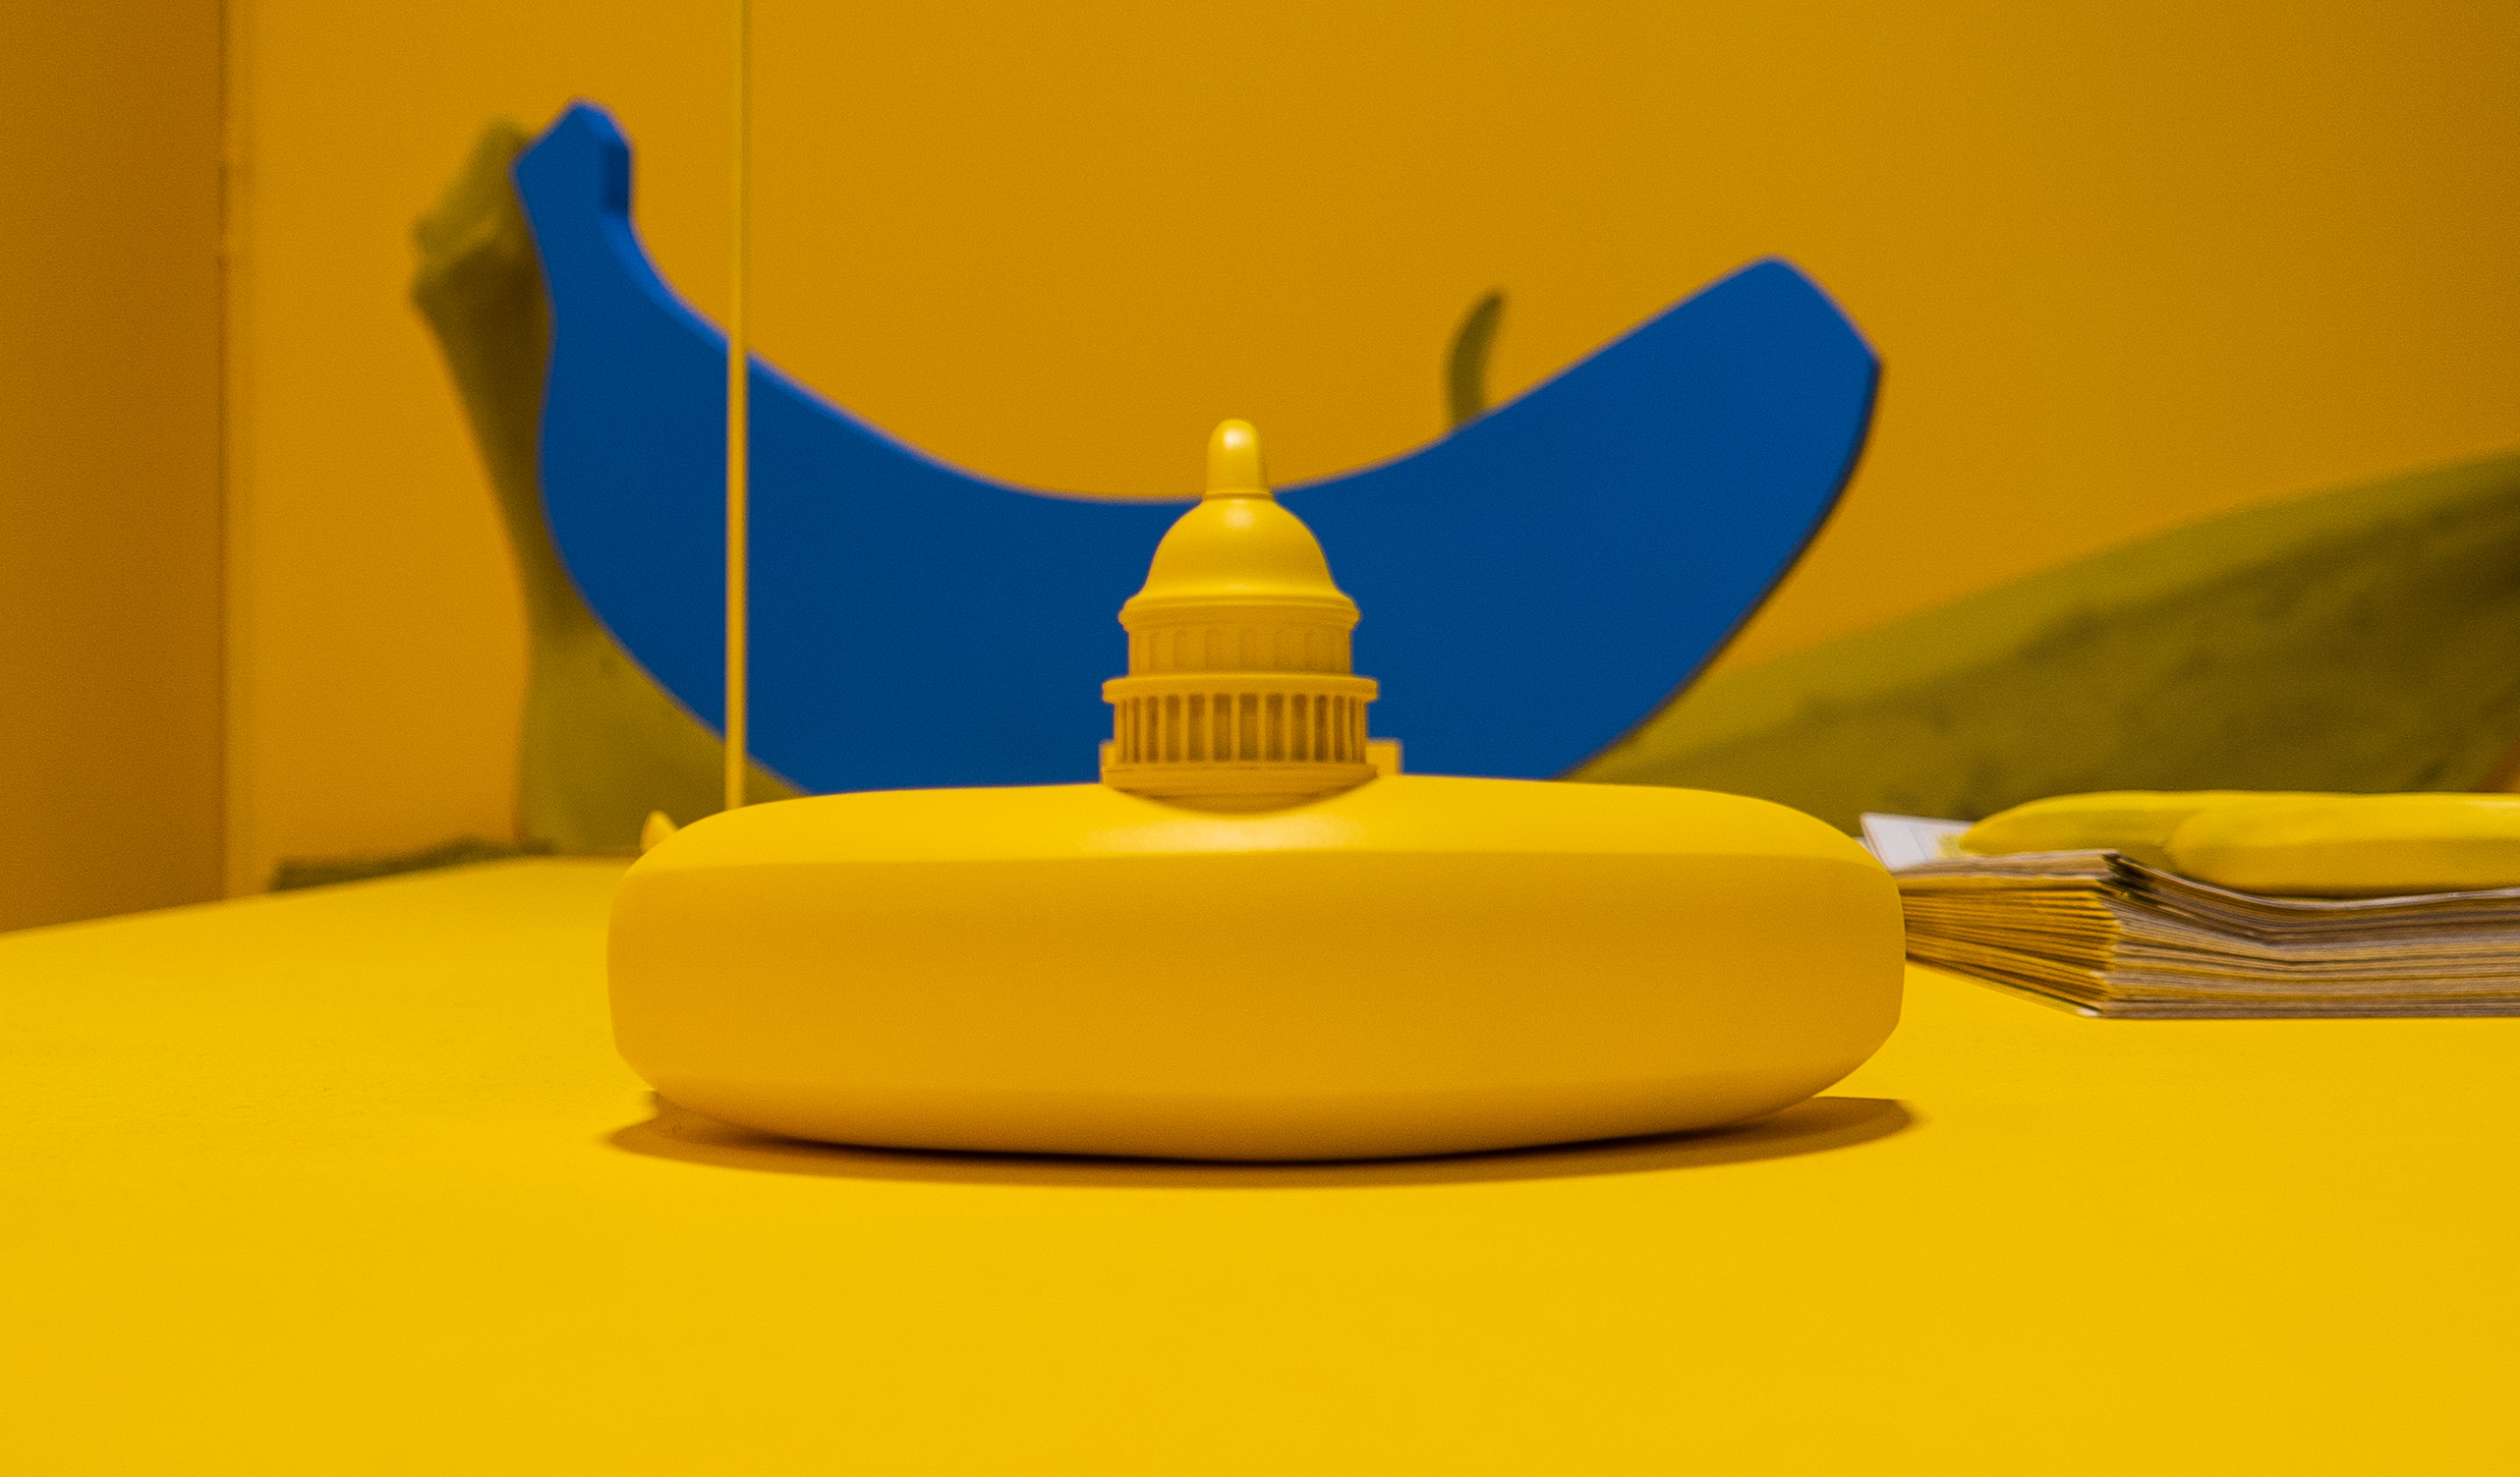 Banana Project 3